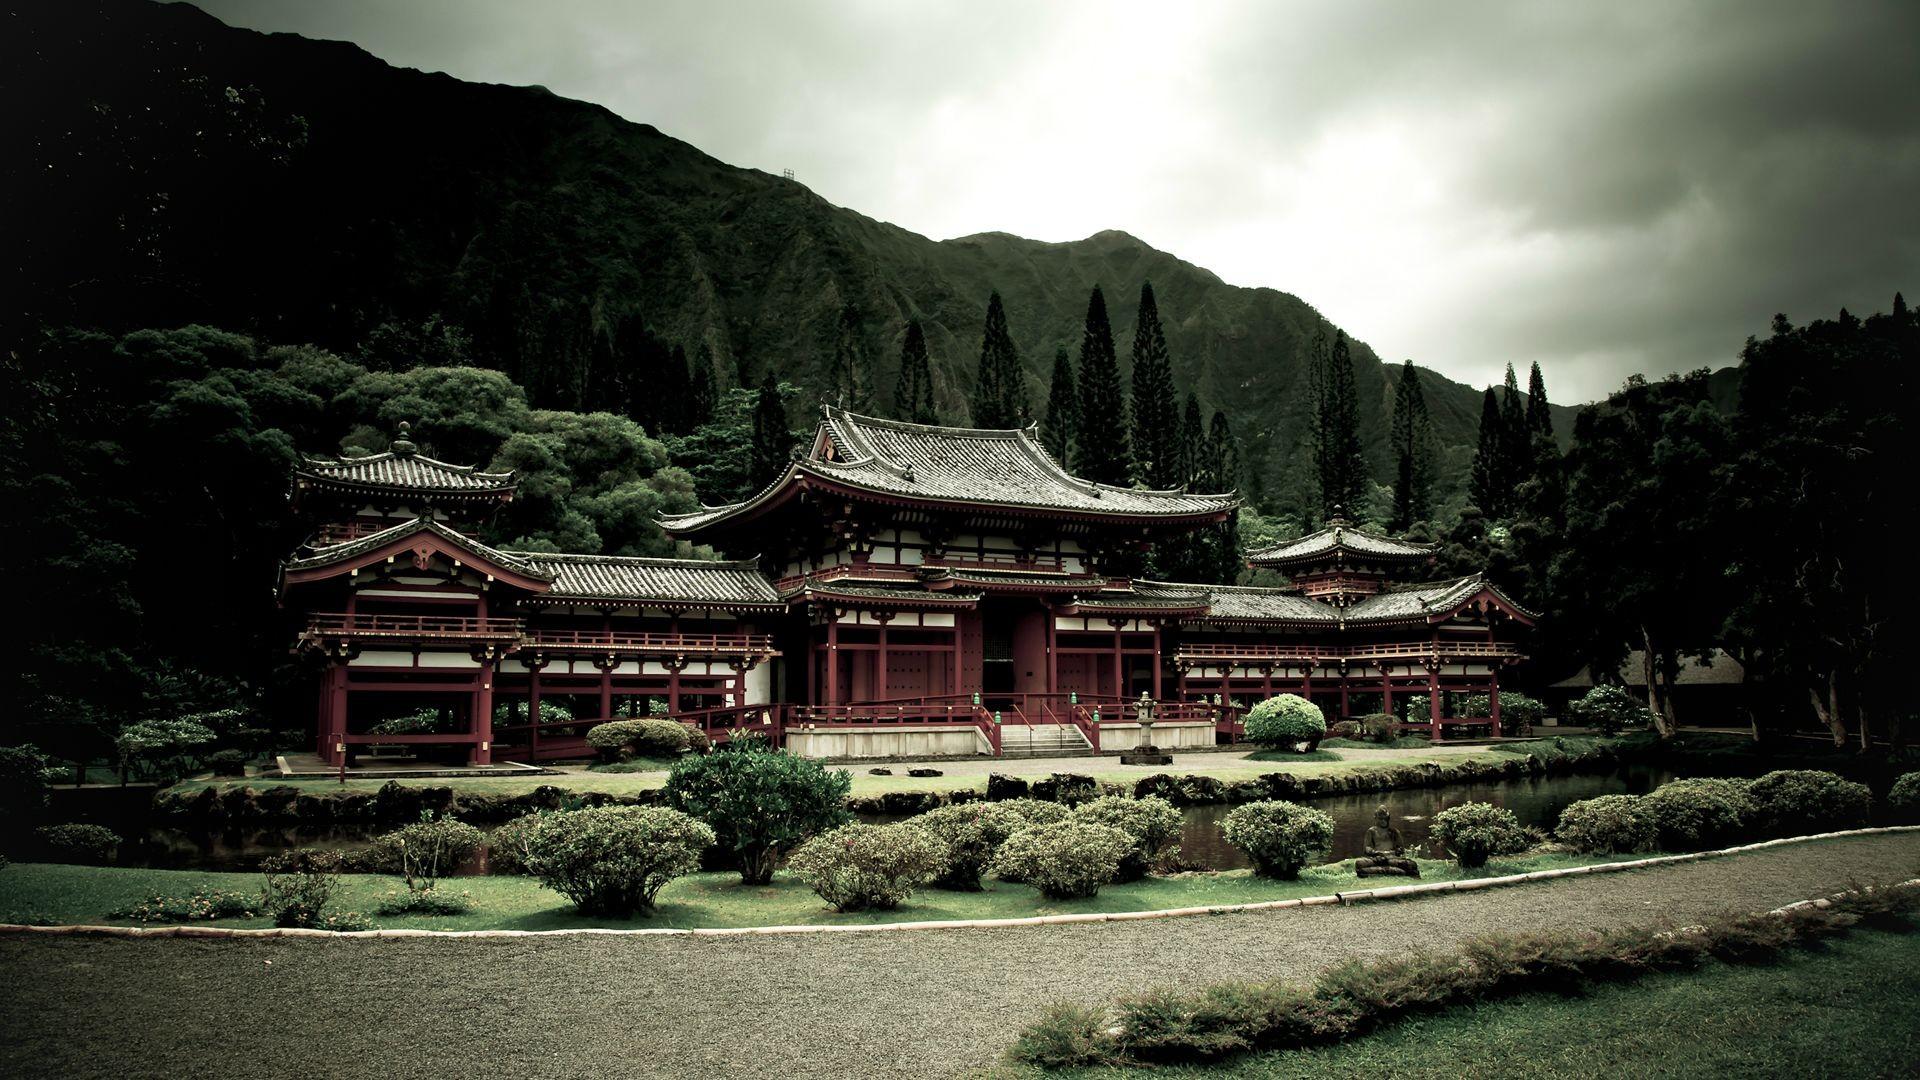 Wallpaper Japan Temple Trees Landscape Forest Mountains Garden Asian Architecture Lake Nature Building Sky Plants Clouds House Tourism